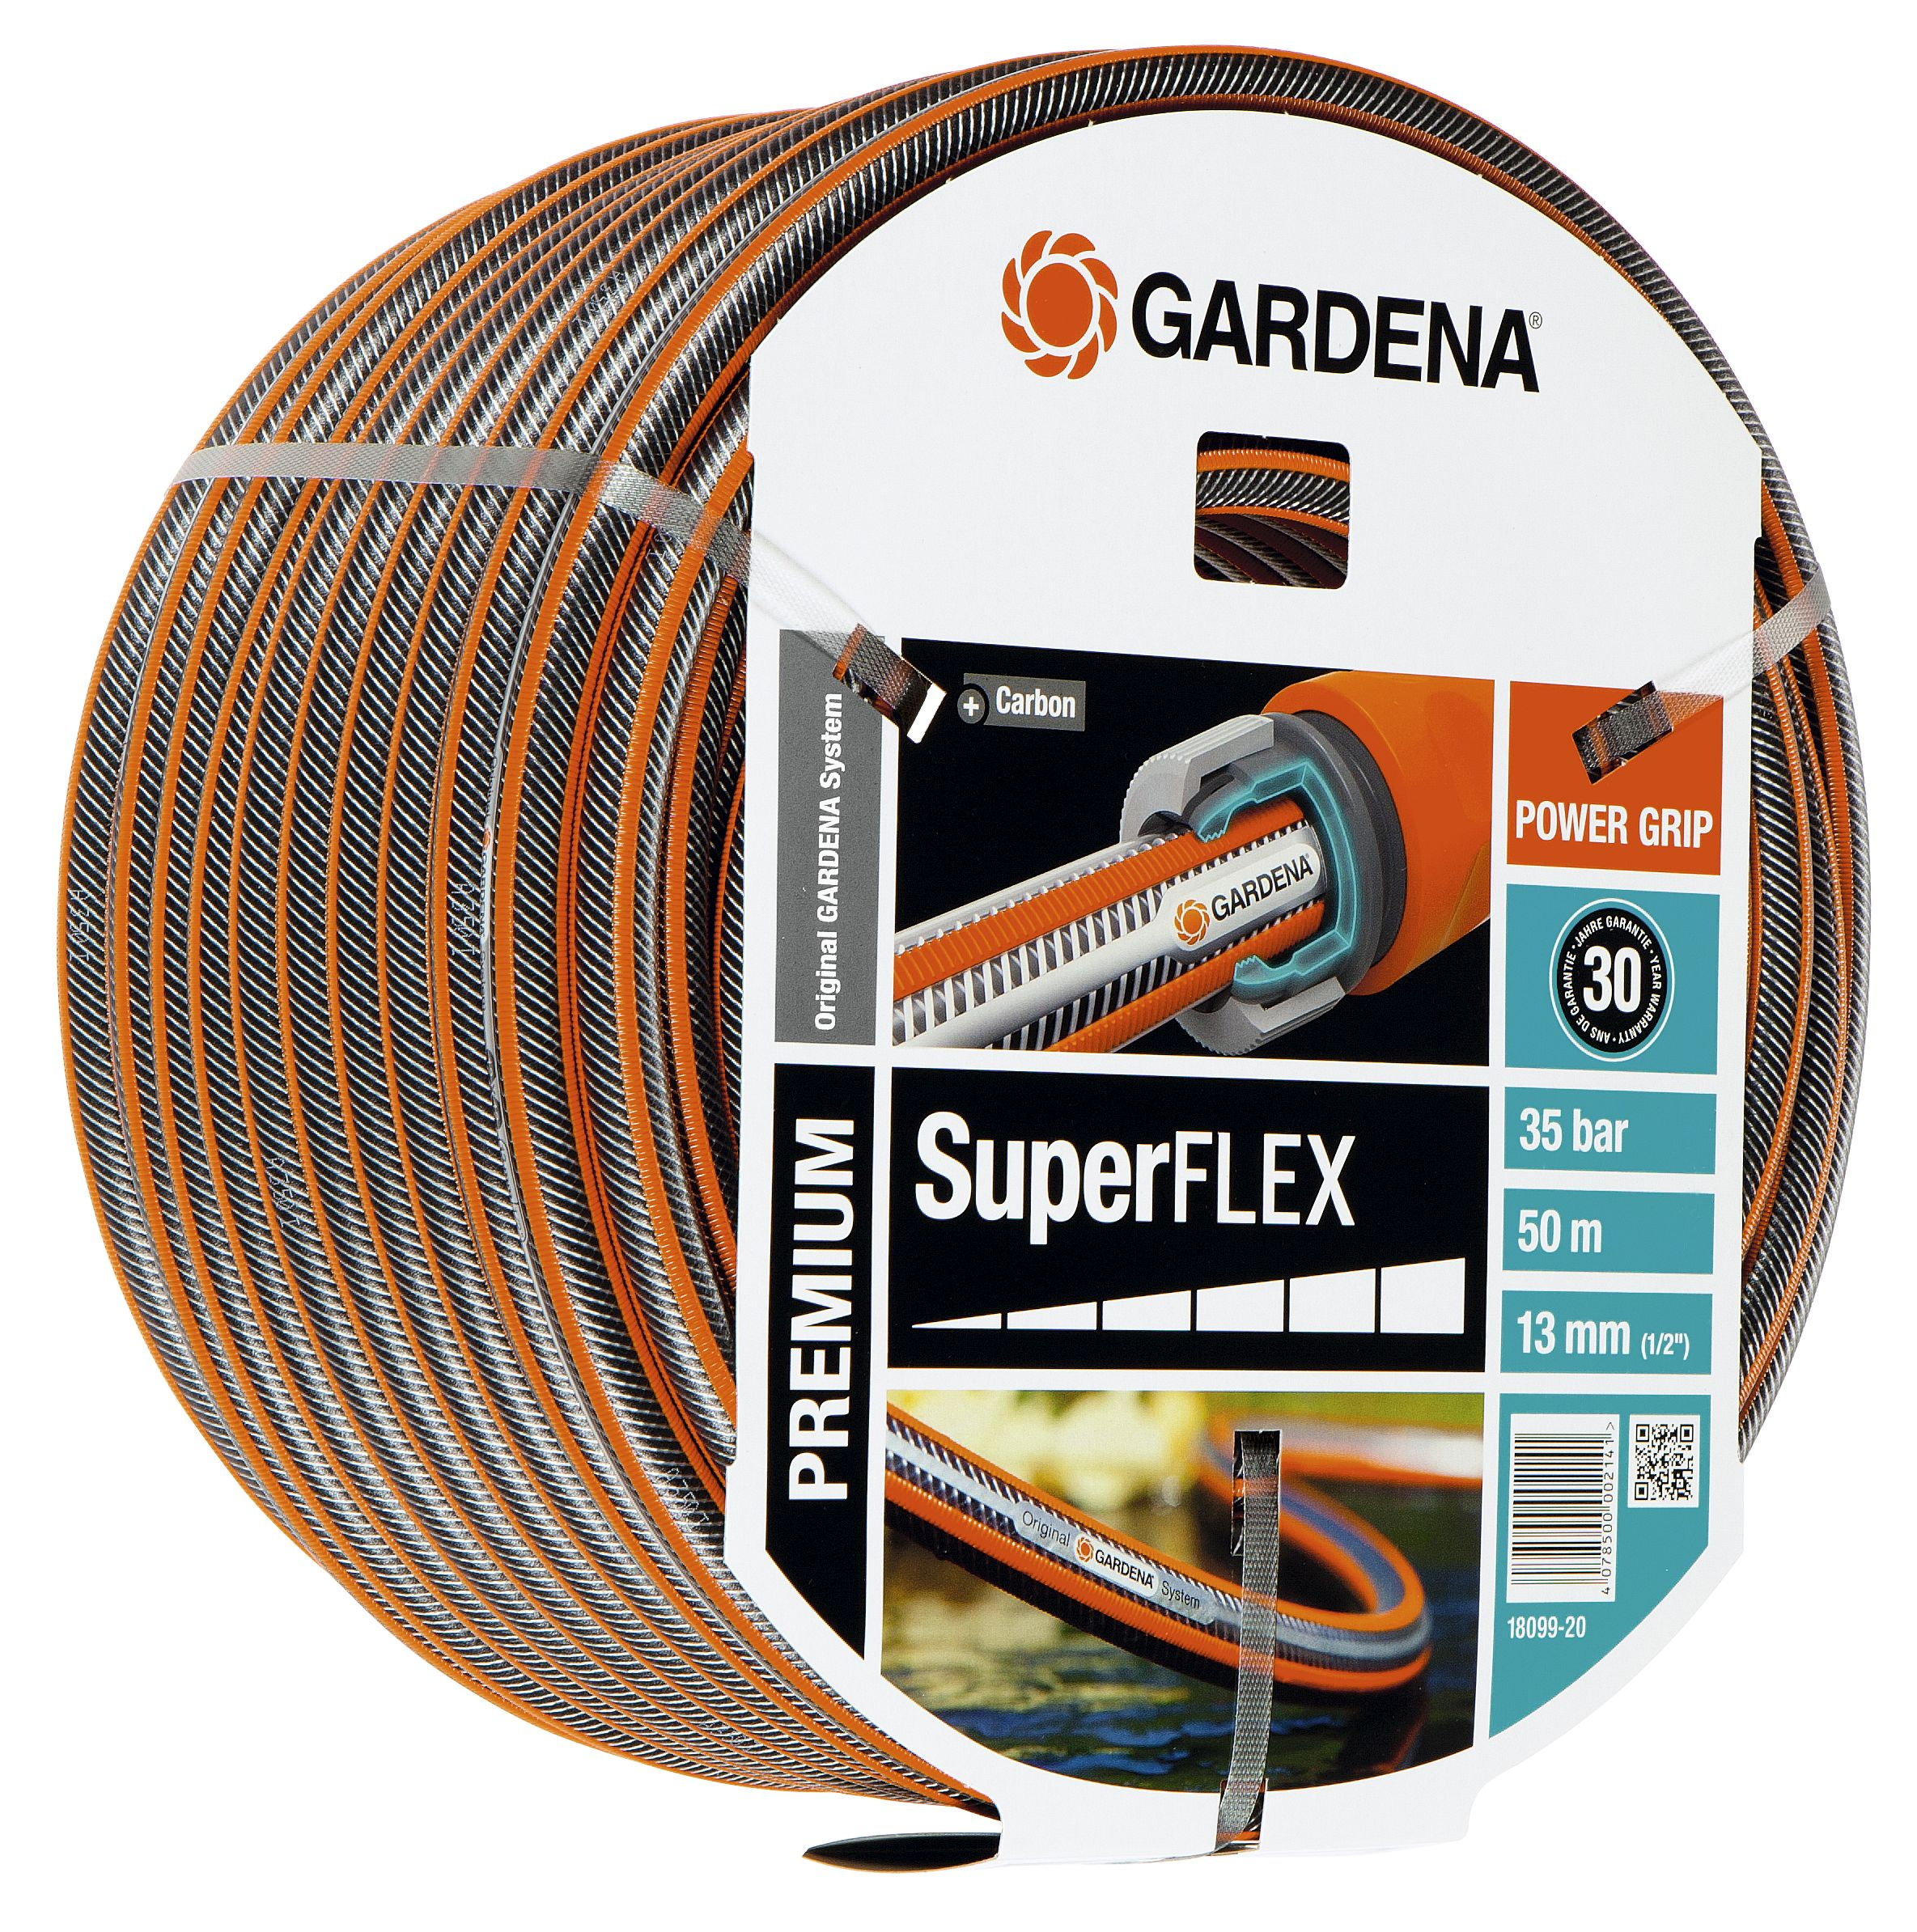 Gardena Comfort Hi Flex Hose 50m 18069 20